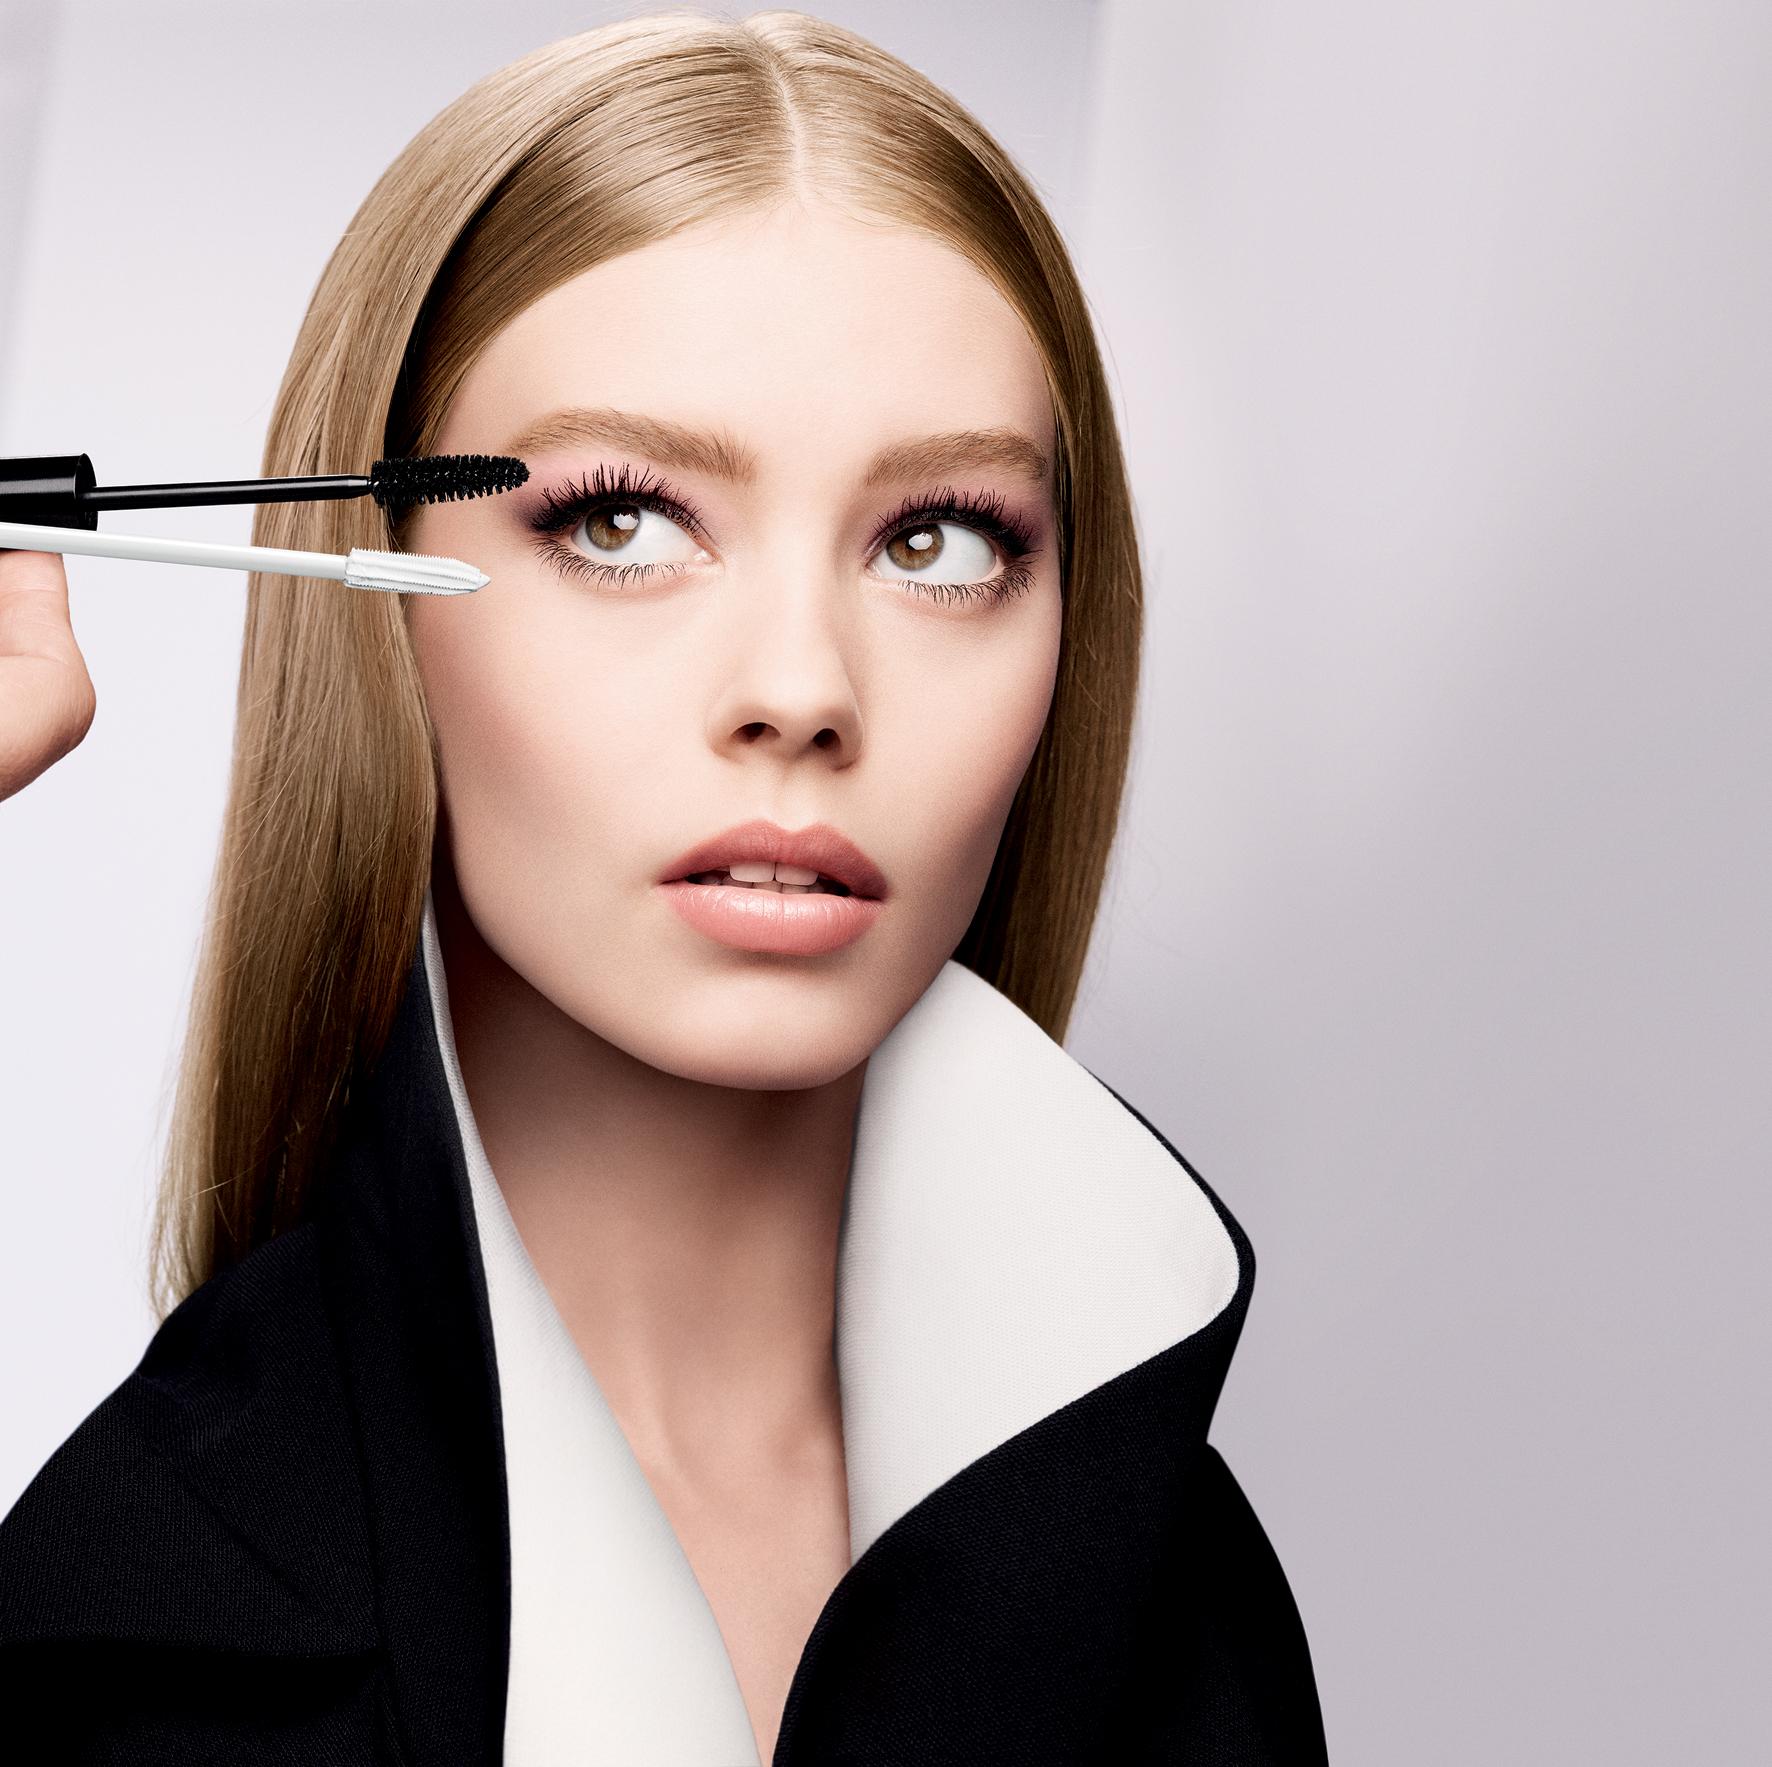 Beauty Diaries by Beauty Line - Diorshow Maximizer 3D